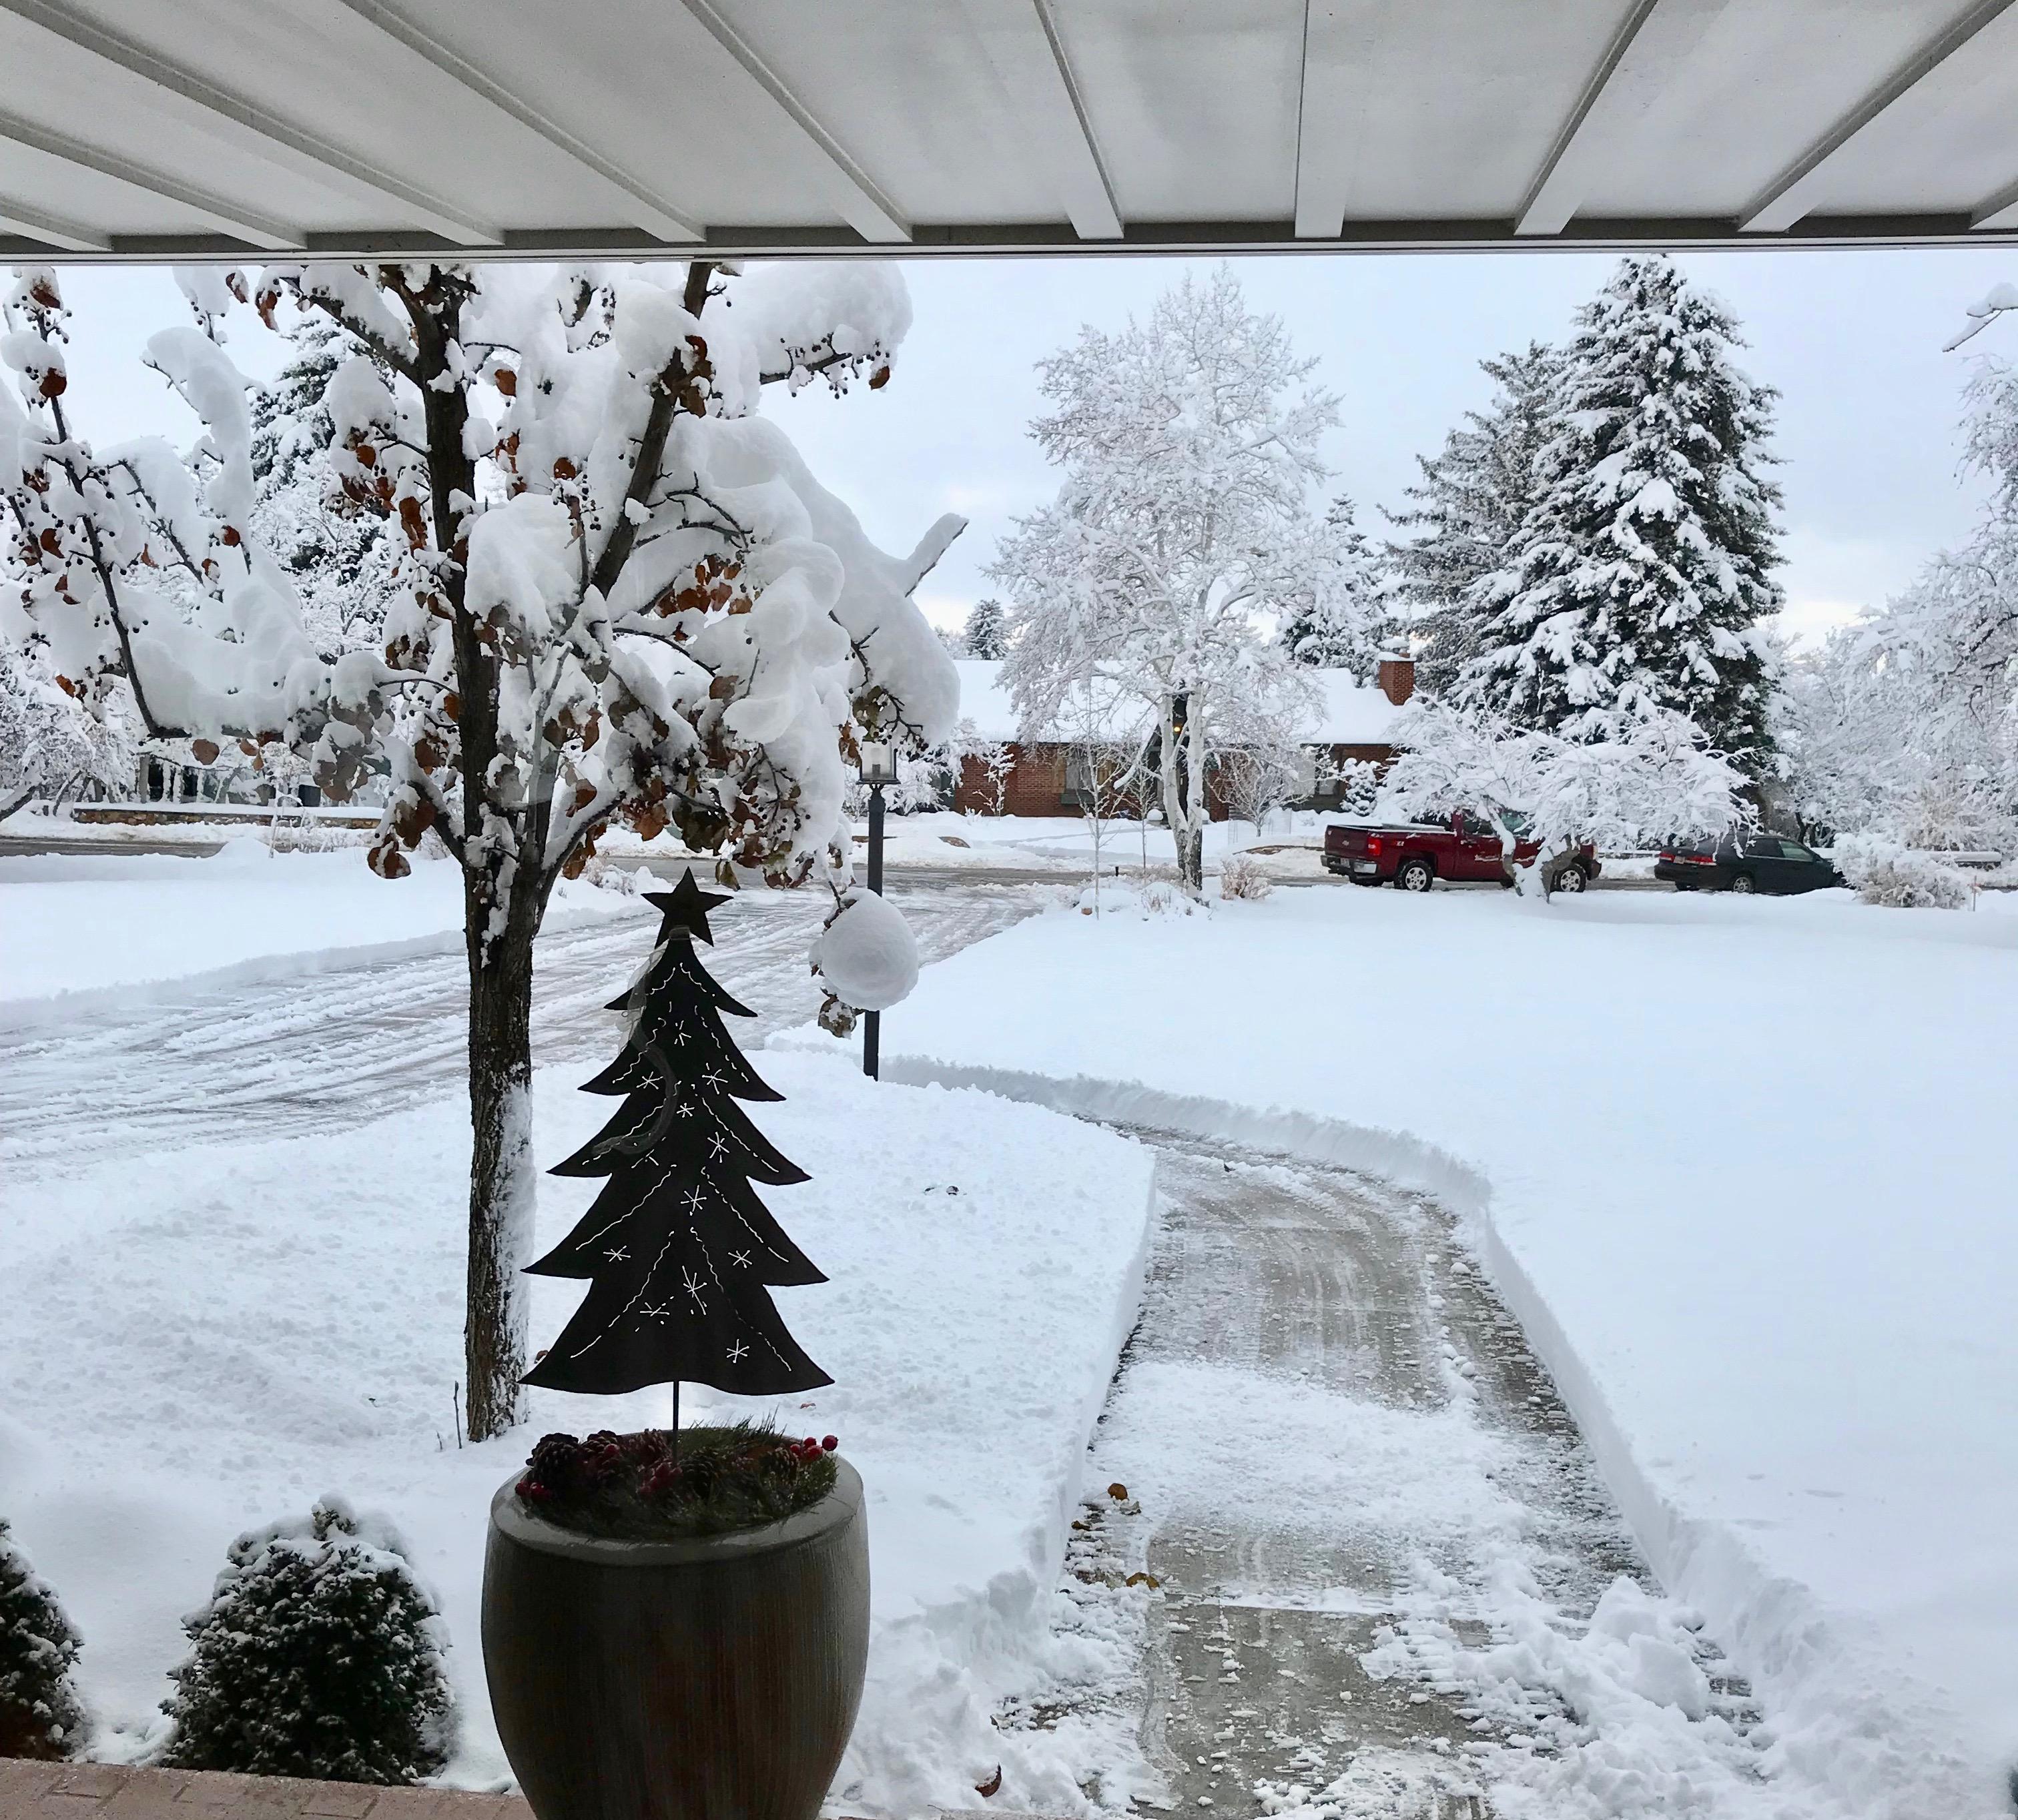 Utah for Christmas! 2018